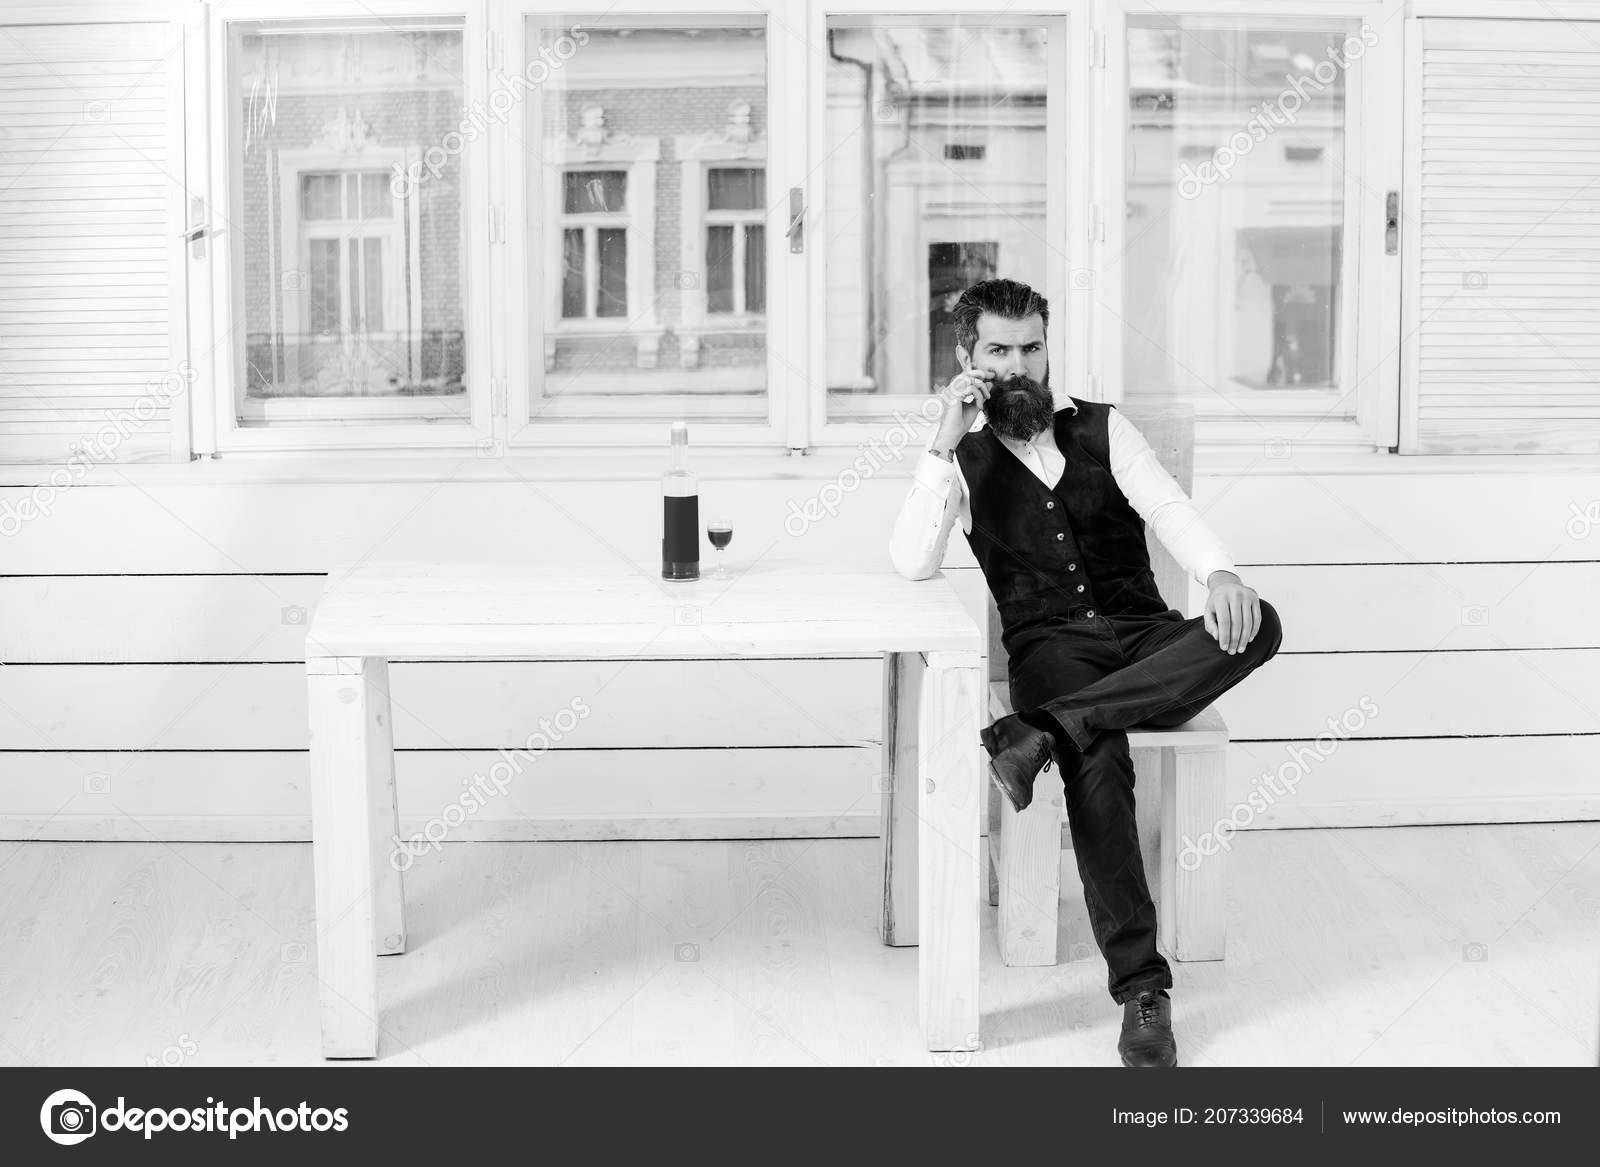 Wondrous Man Sitting On Chair At Table With Bottle And Glass Stock Frankydiablos Diy Chair Ideas Frankydiabloscom